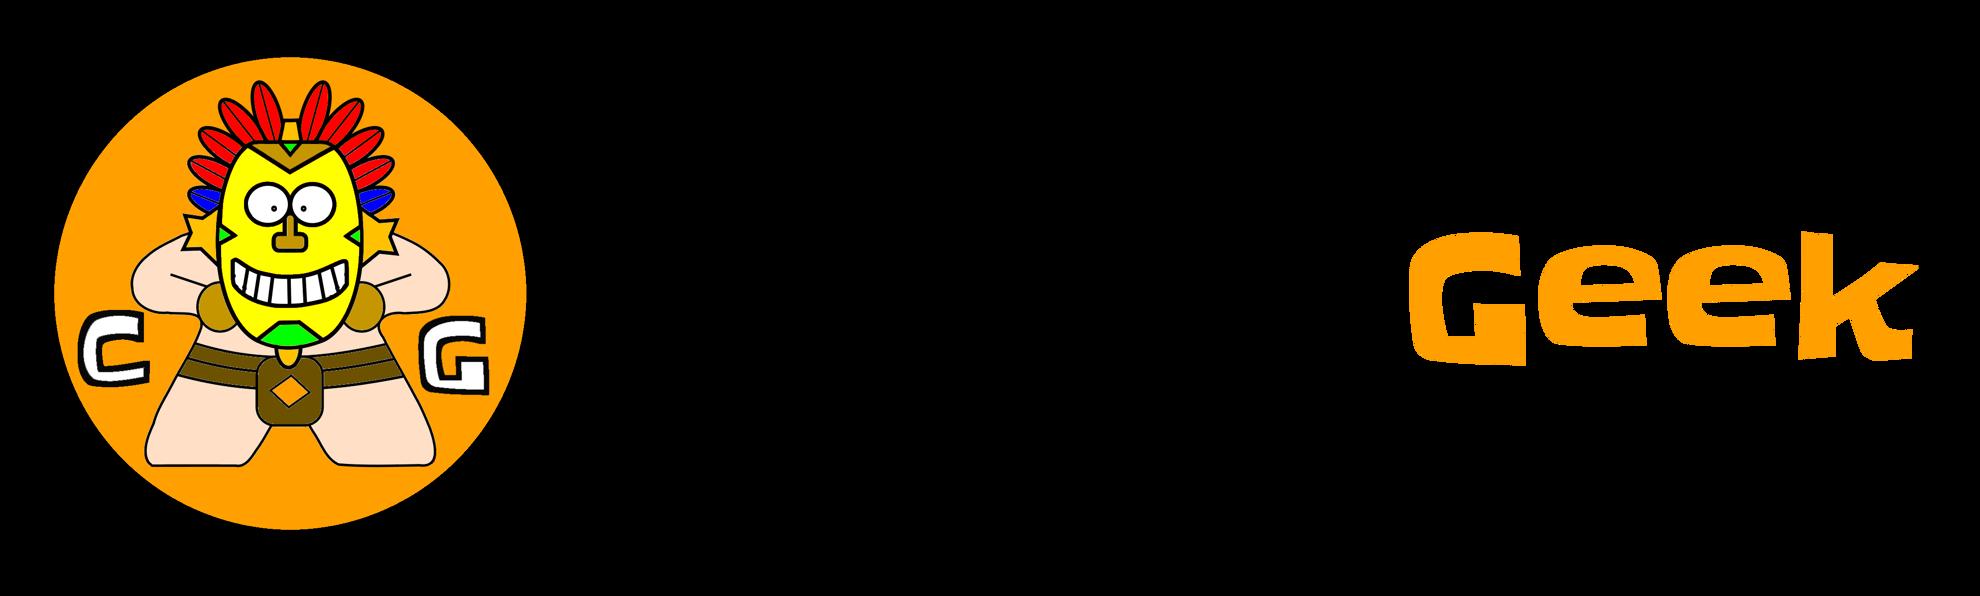 ChamanGeek